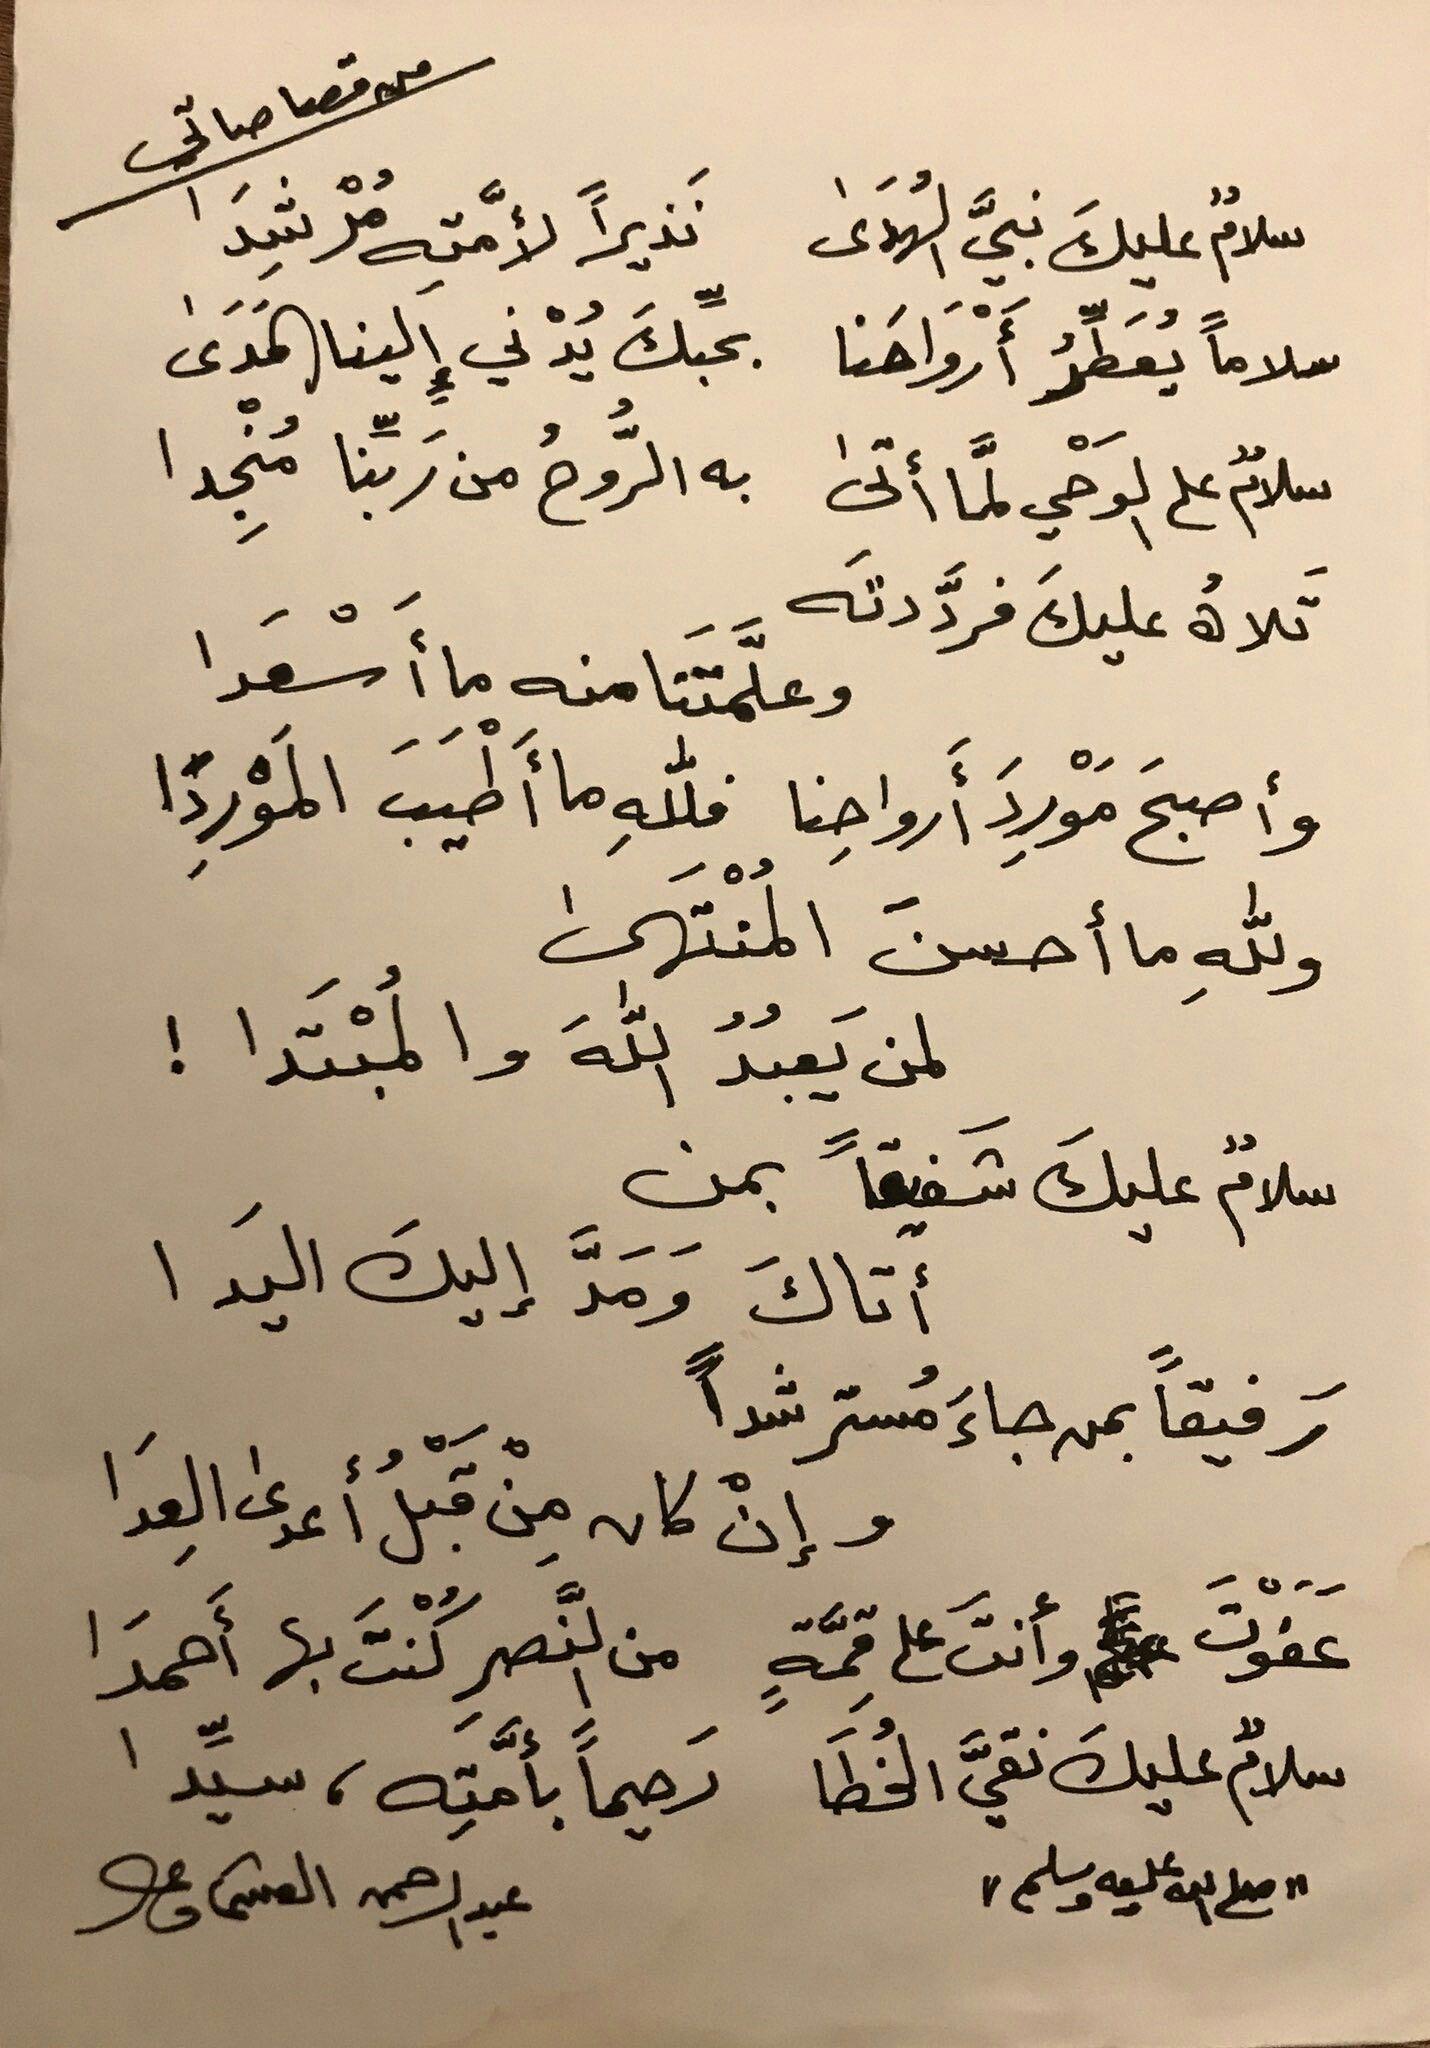 سلام عليك نبي الهدى Love In Islam Peace Be Upon Him Sheet Music